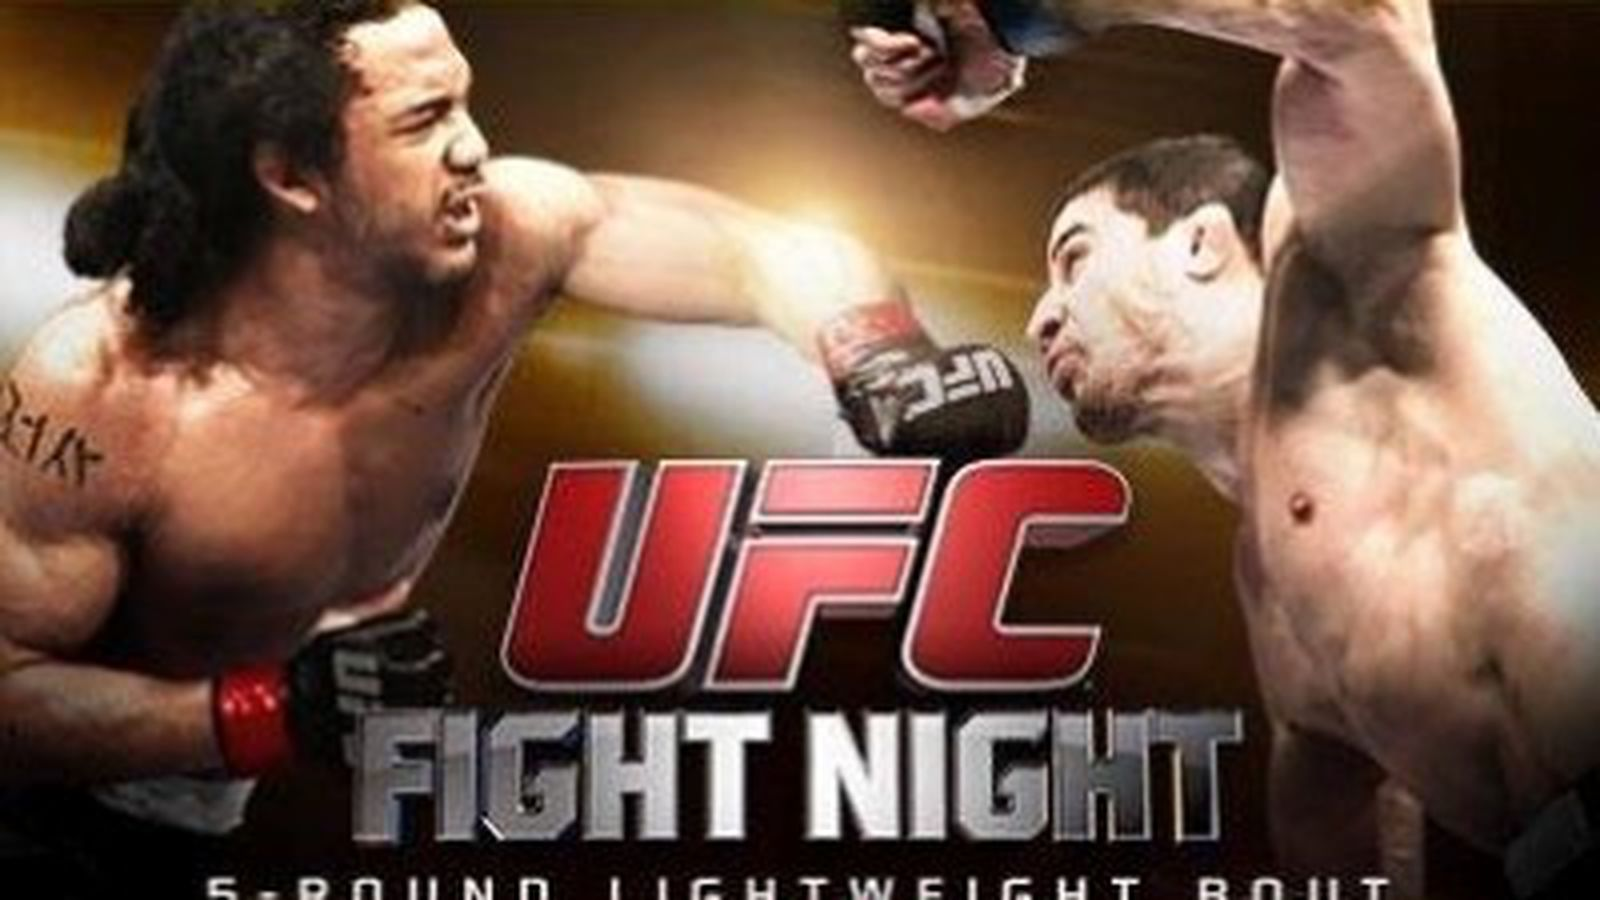 https://cdn0.vox-cdn.com/thumbor/KUyyTTAZx6YGRiahbzK63OHPtK8=/0x0:400x225/1600x900/cdn0.vox-cdn.com/uploads/chorus_image/image/34021017/Henderson-vs-Khabilov-UFC-Albuquerque-poster-400x330.0.jpg